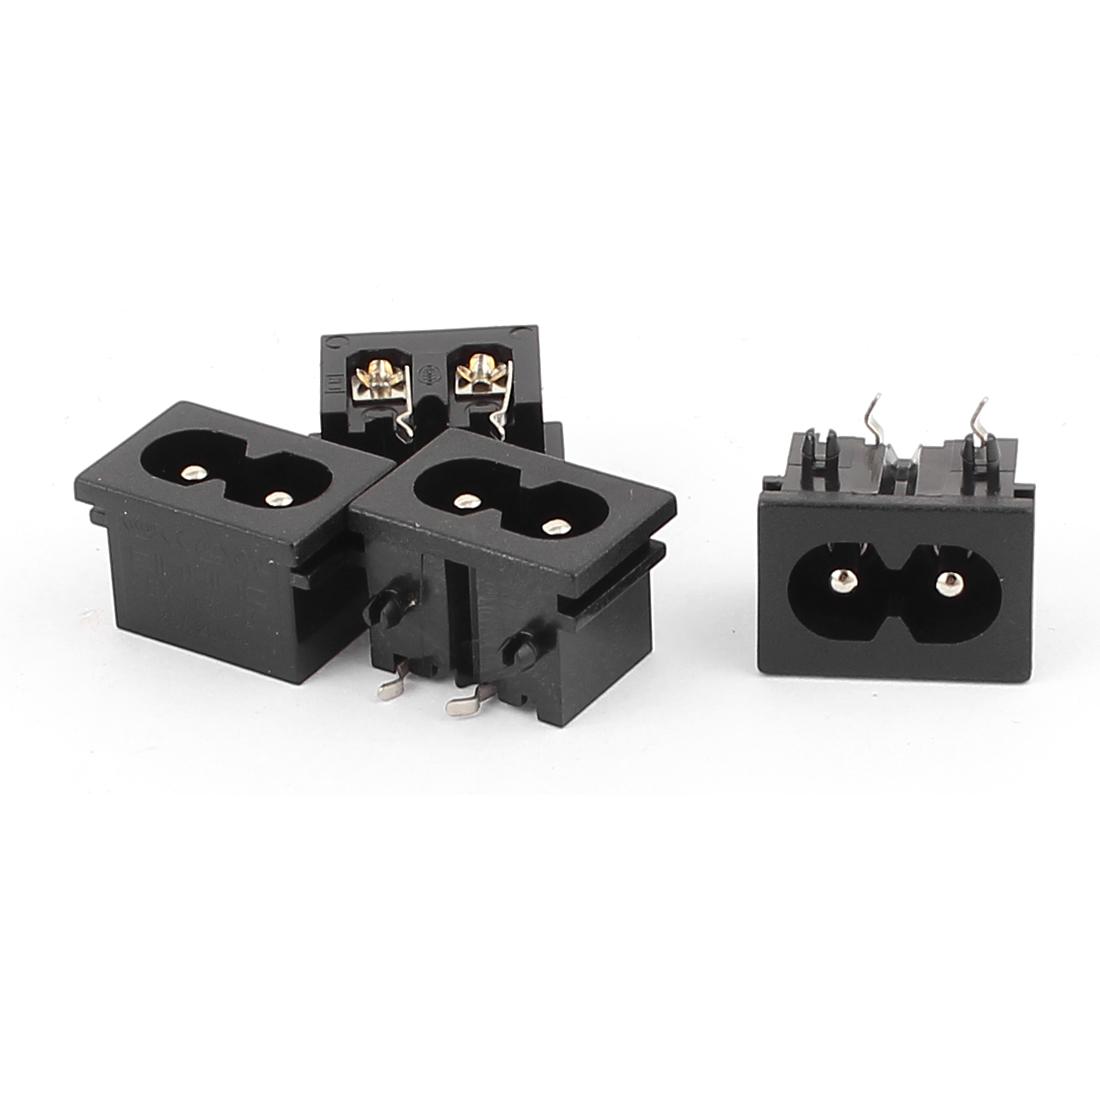 AC 250V 2.5A IEC320 C8 Male Connector Power Socket Adapter Black BX-180-B 4PCS